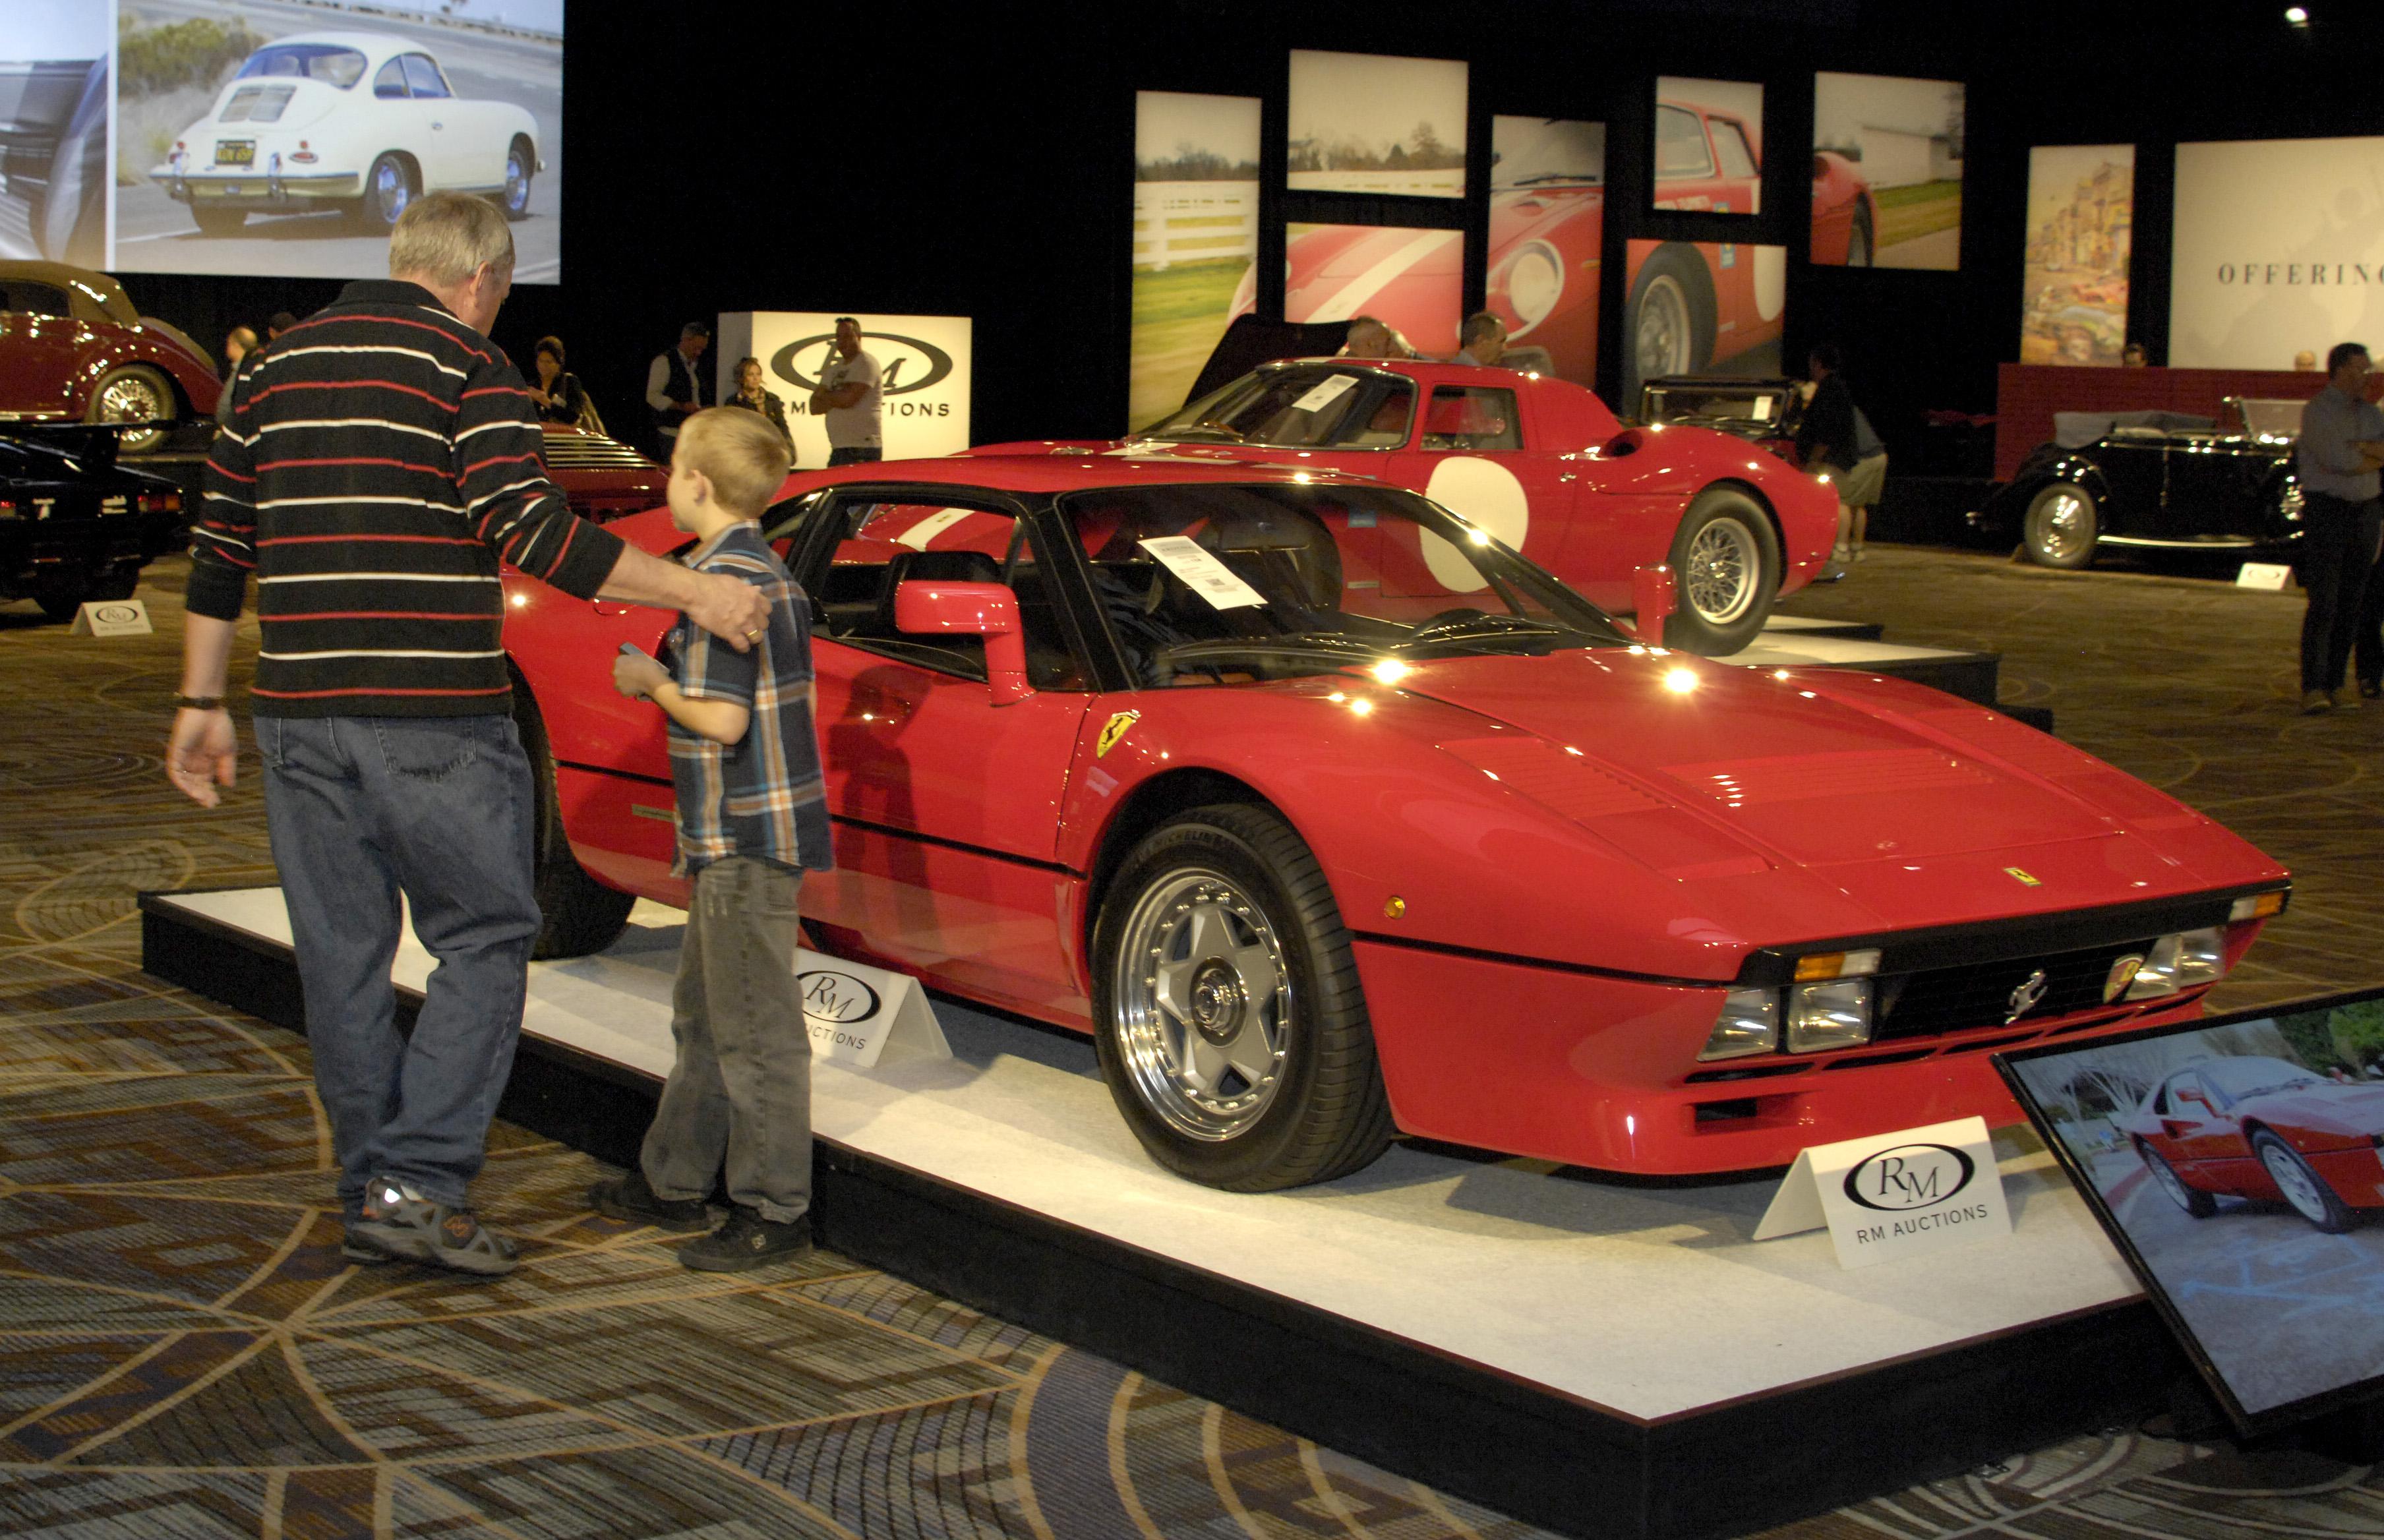 Dad-should-we-buy-a-Ferrari-GTO-RM-388-Howard-Koby-photo ...